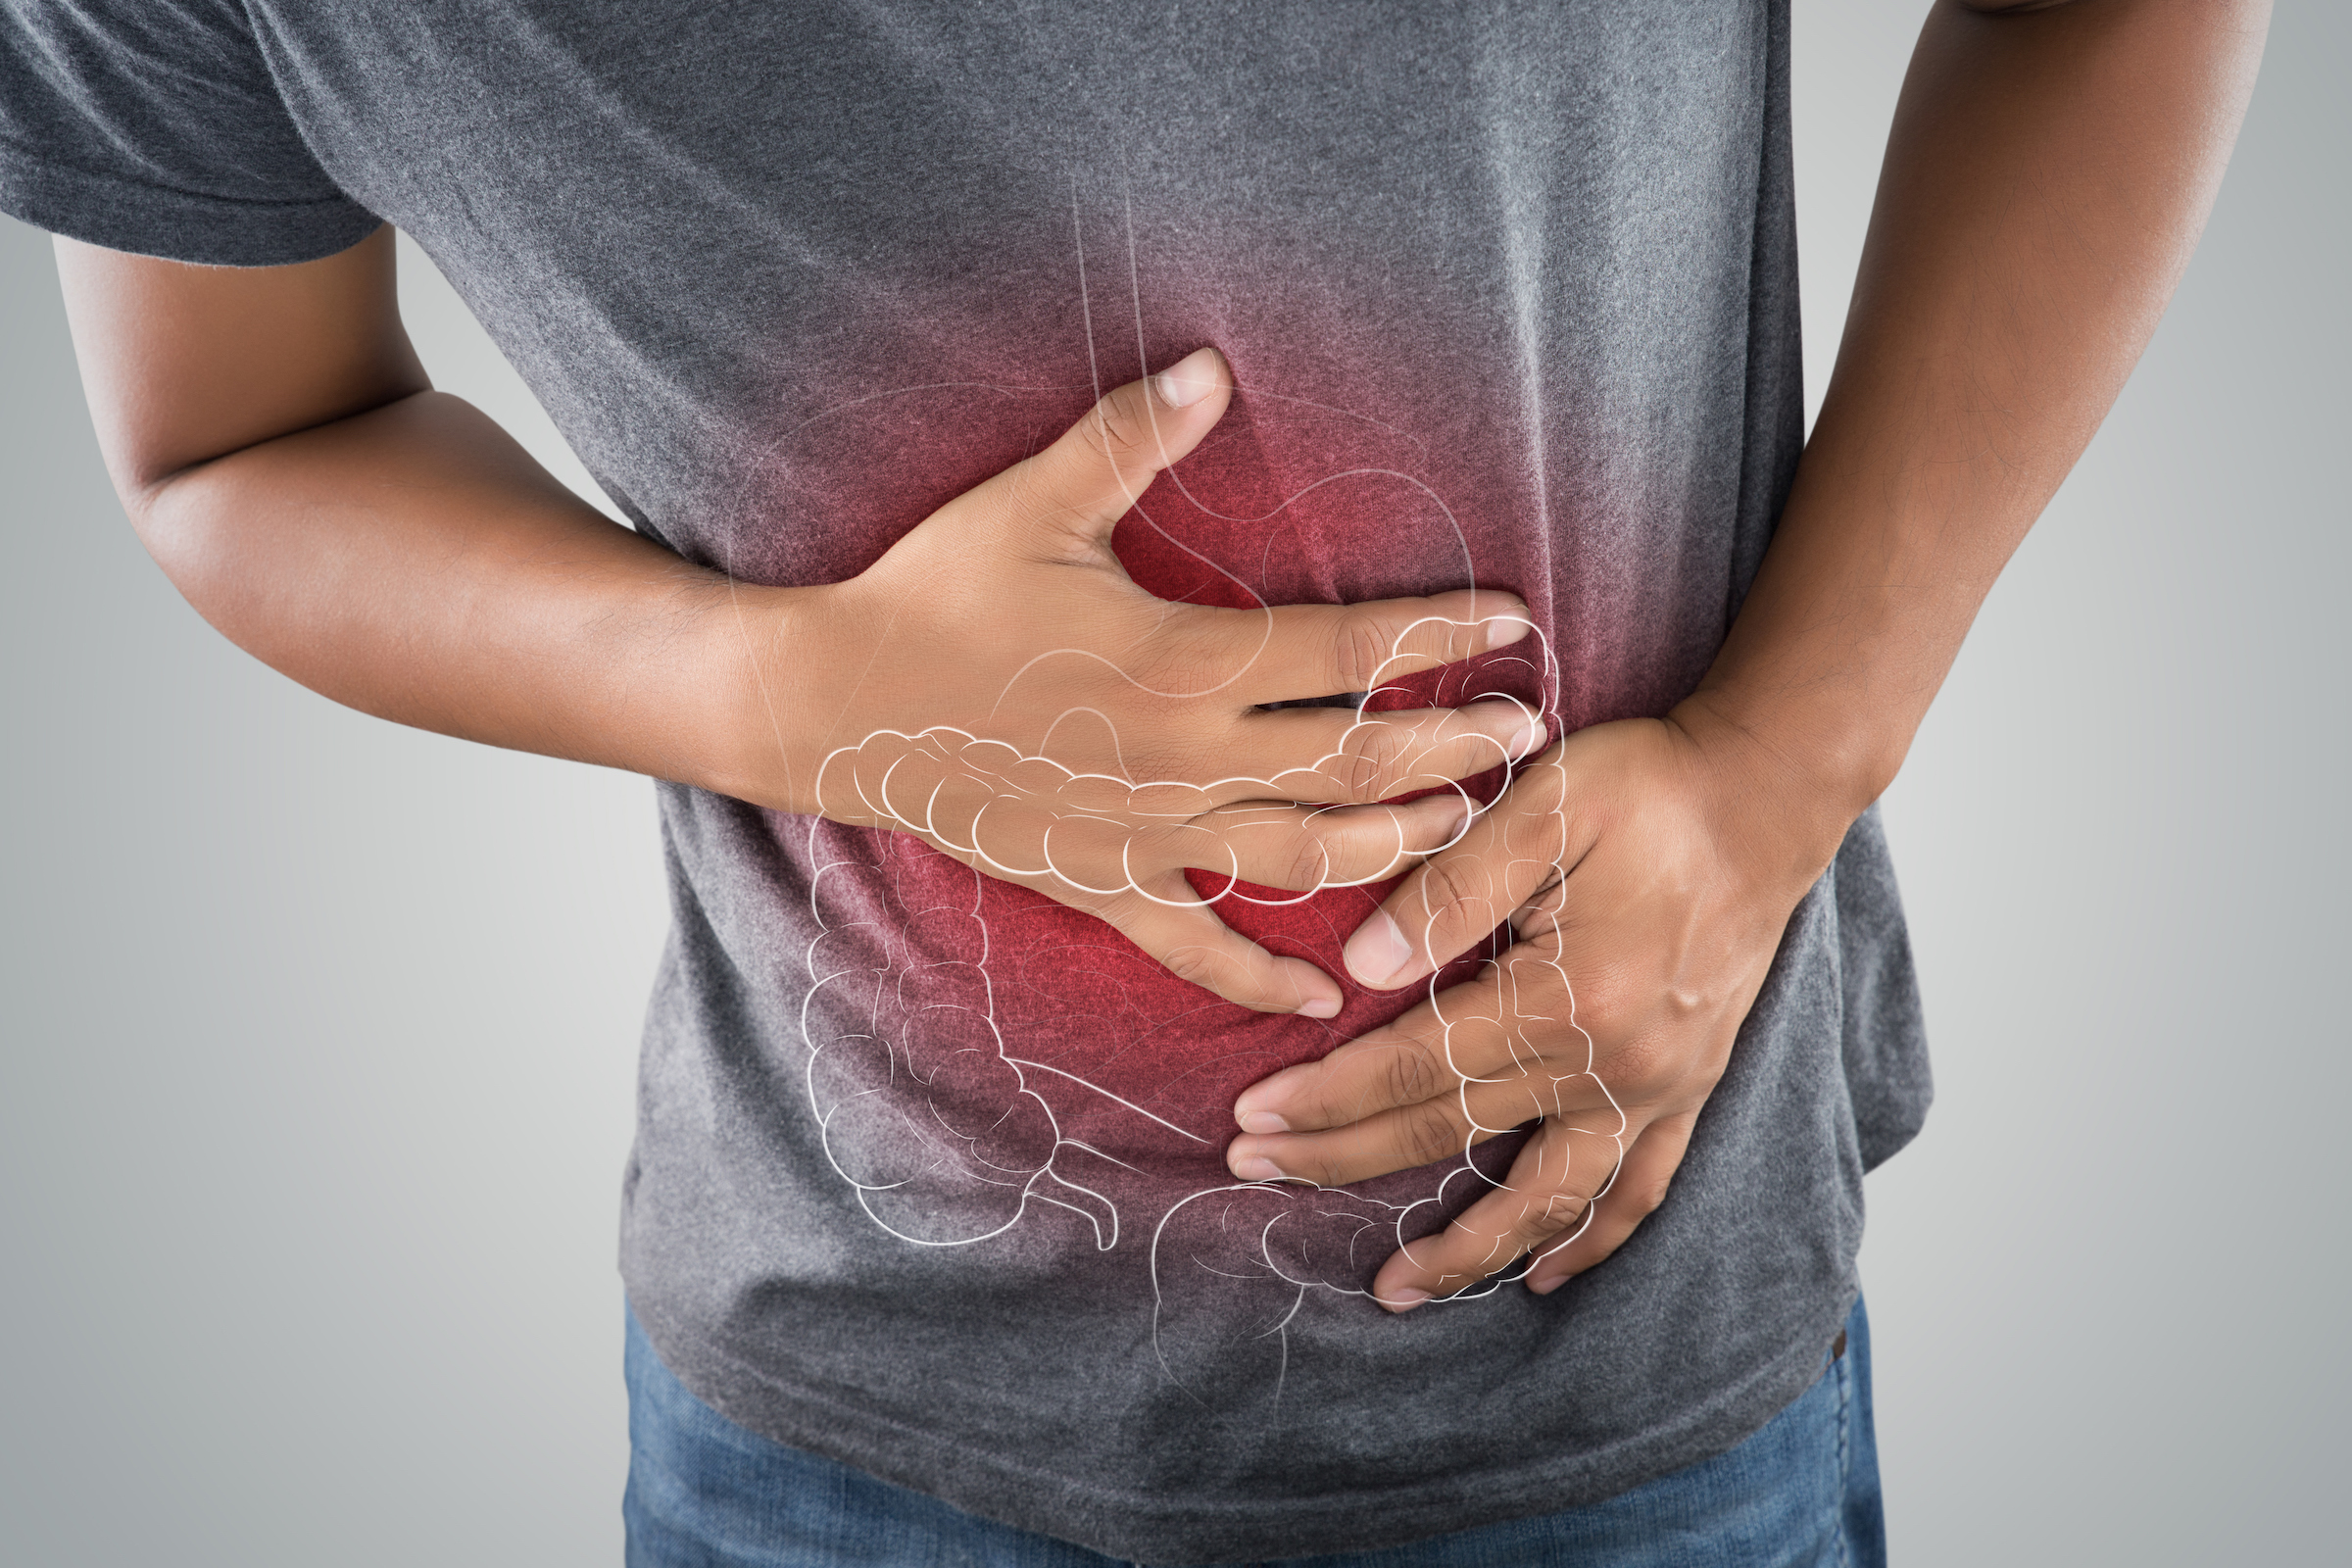 cancer abdominal pain colon